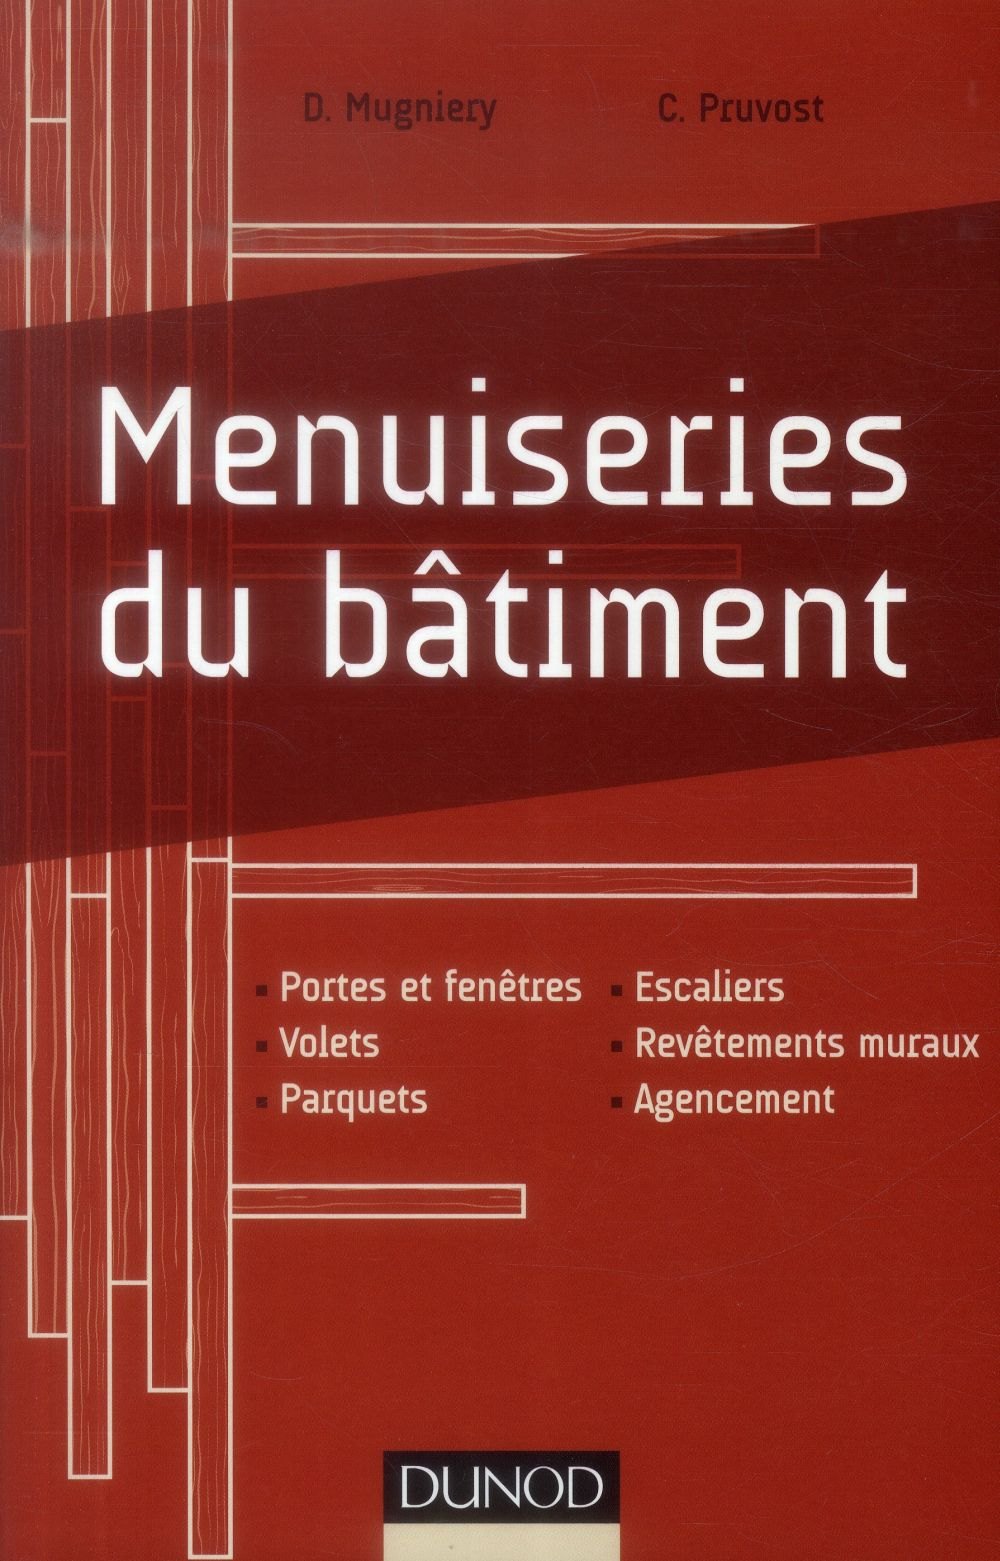 MENUISERIES DU BATIMENT MUGNIERY  / PRUVOST Dunod